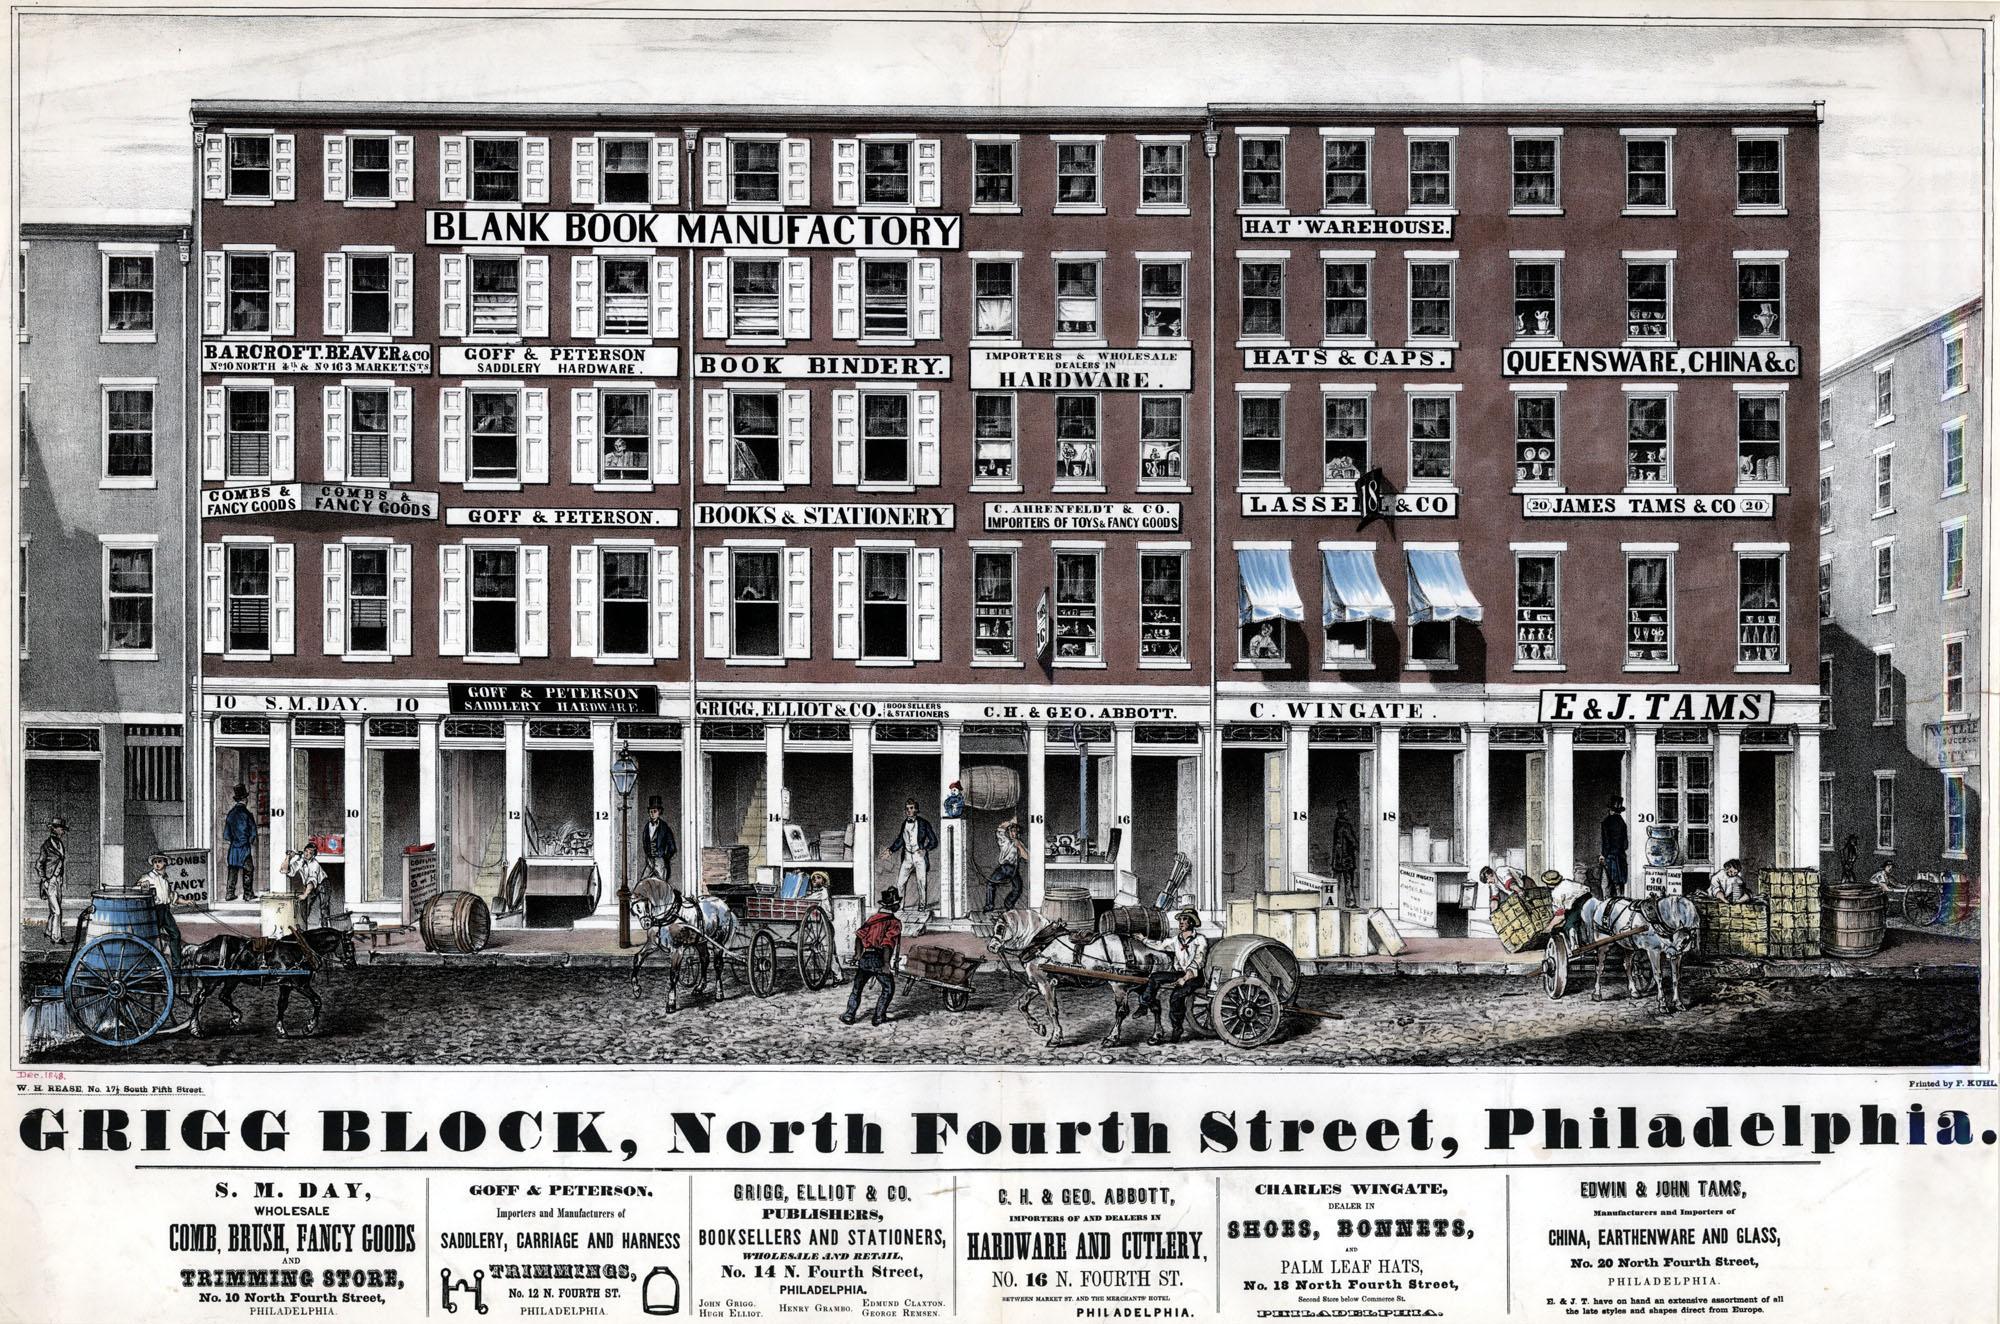 Rease, W. H. Grigg Block, North Fourth Street, Philadelphia. [Philadelphia, 1848].